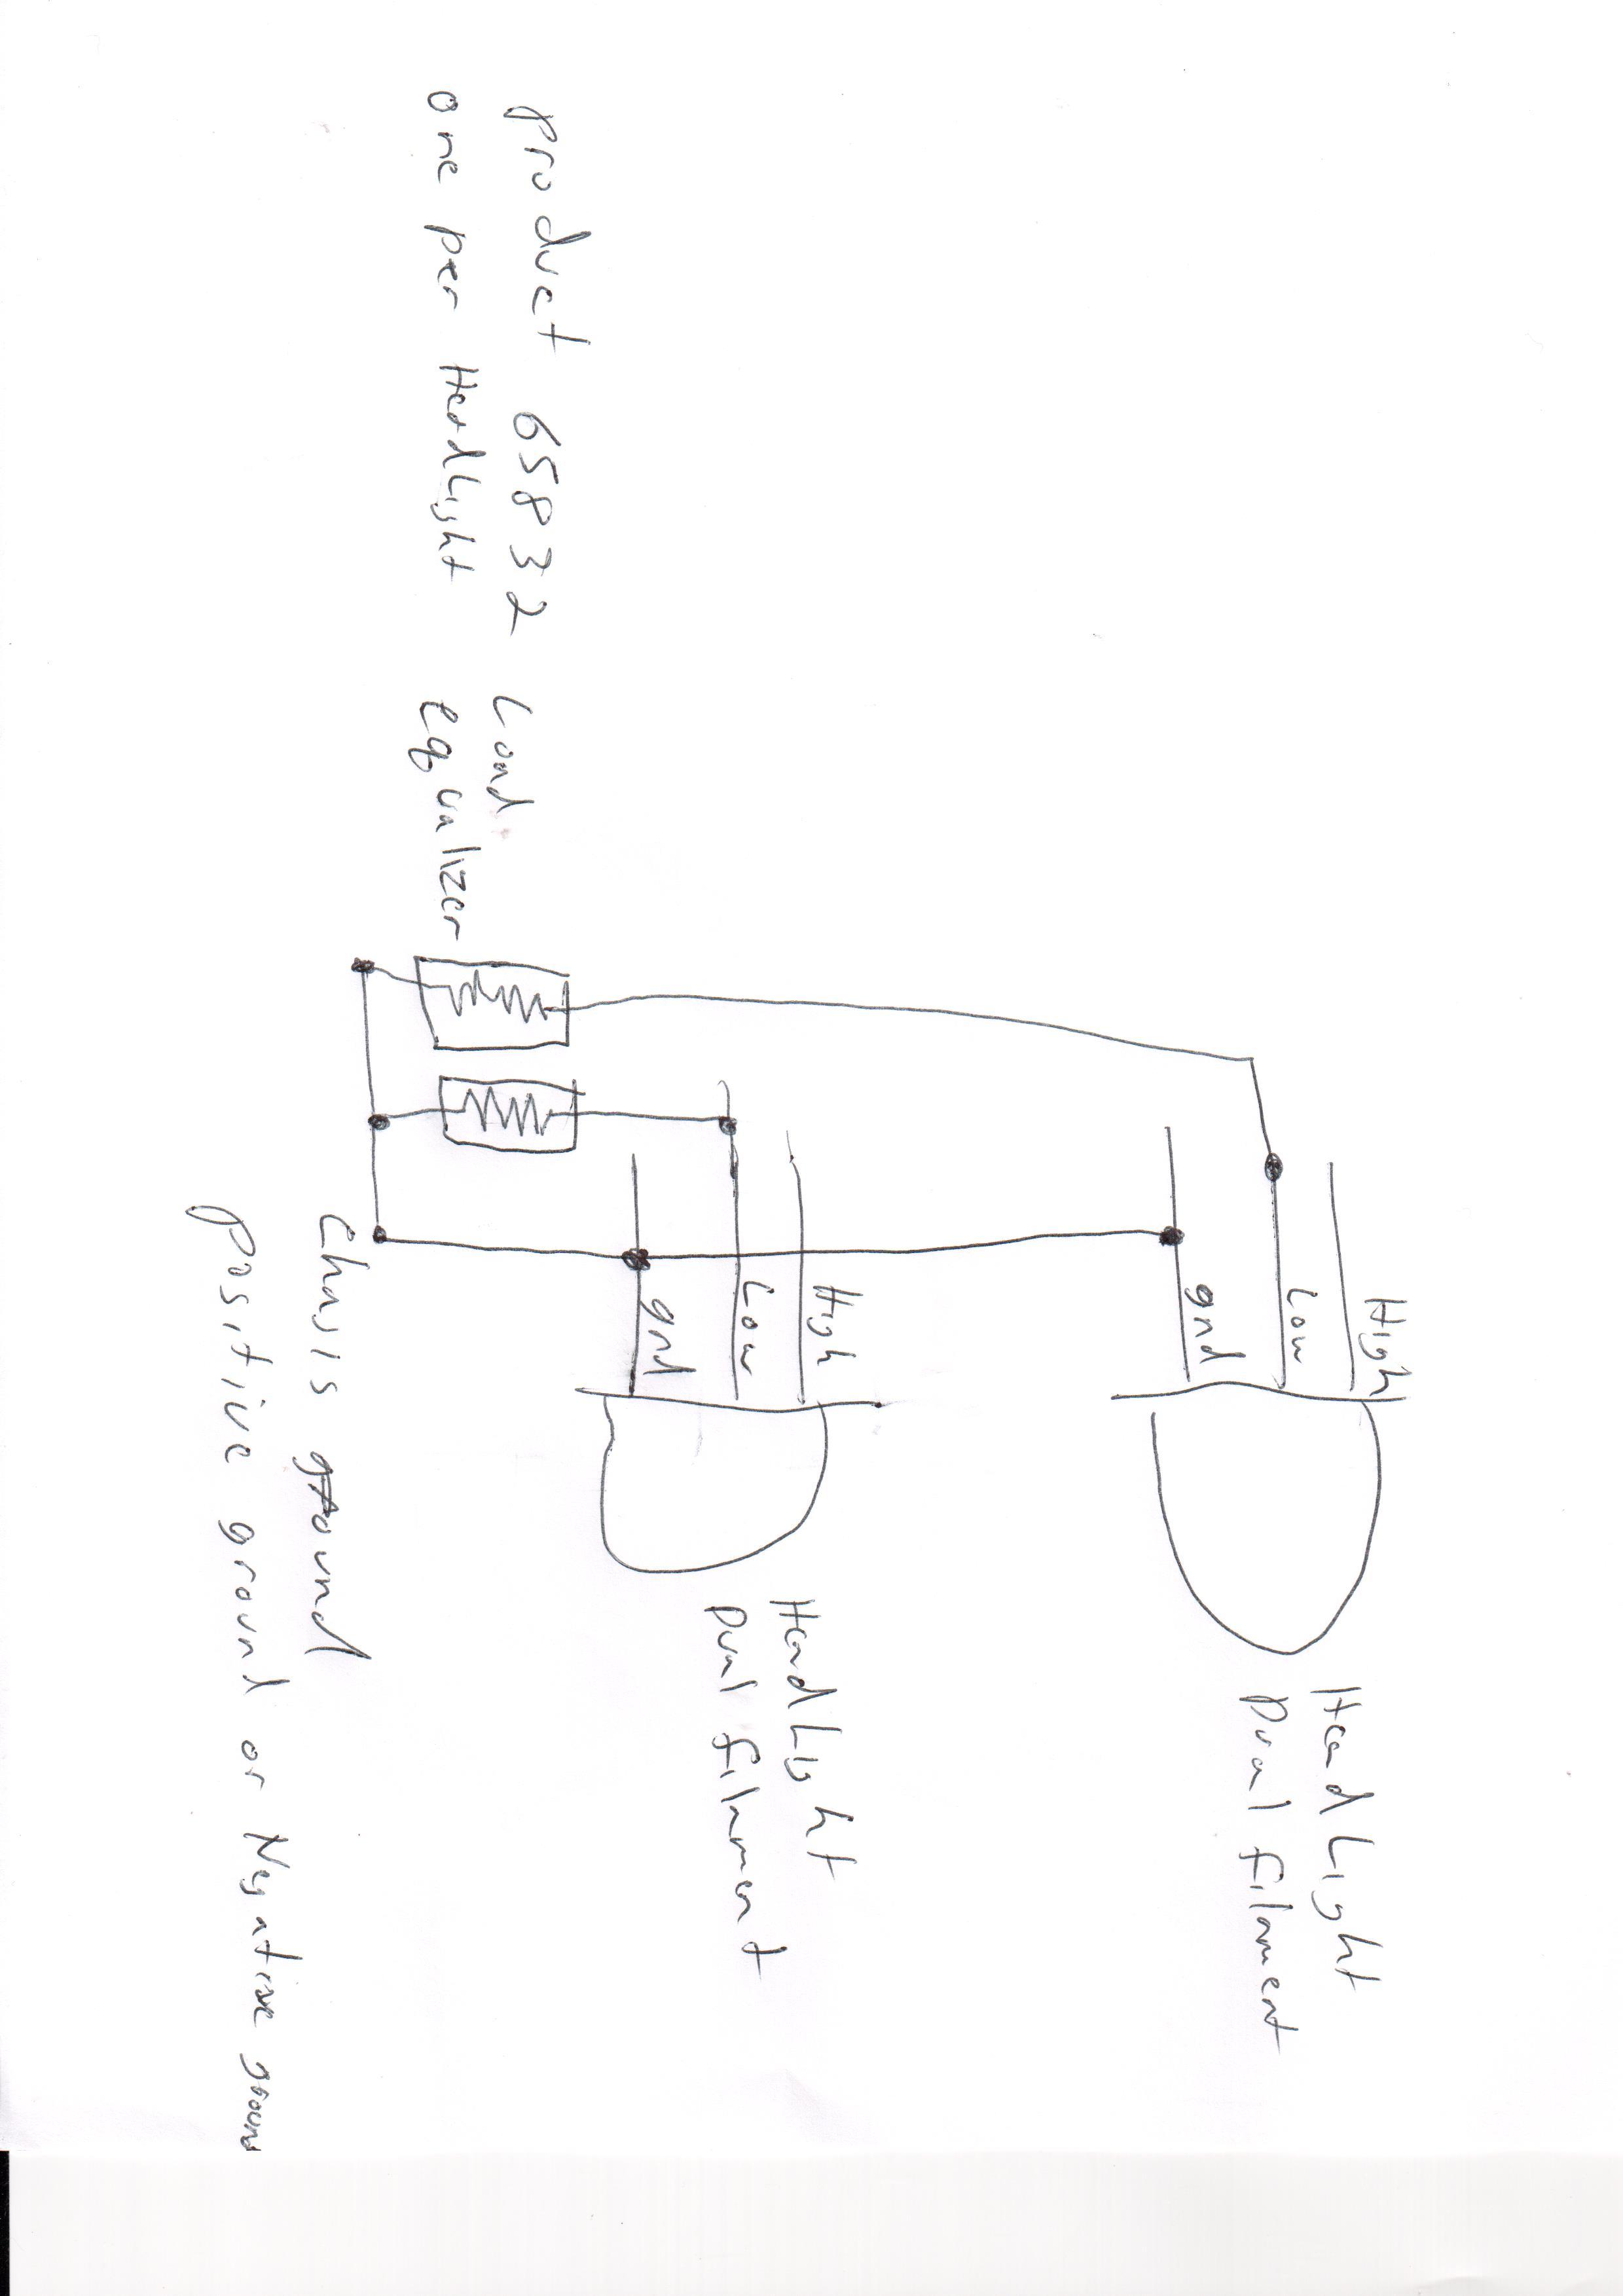 Led Headlight Load Equalizer 6 Volt 6 Ohm 50 Watt Pair